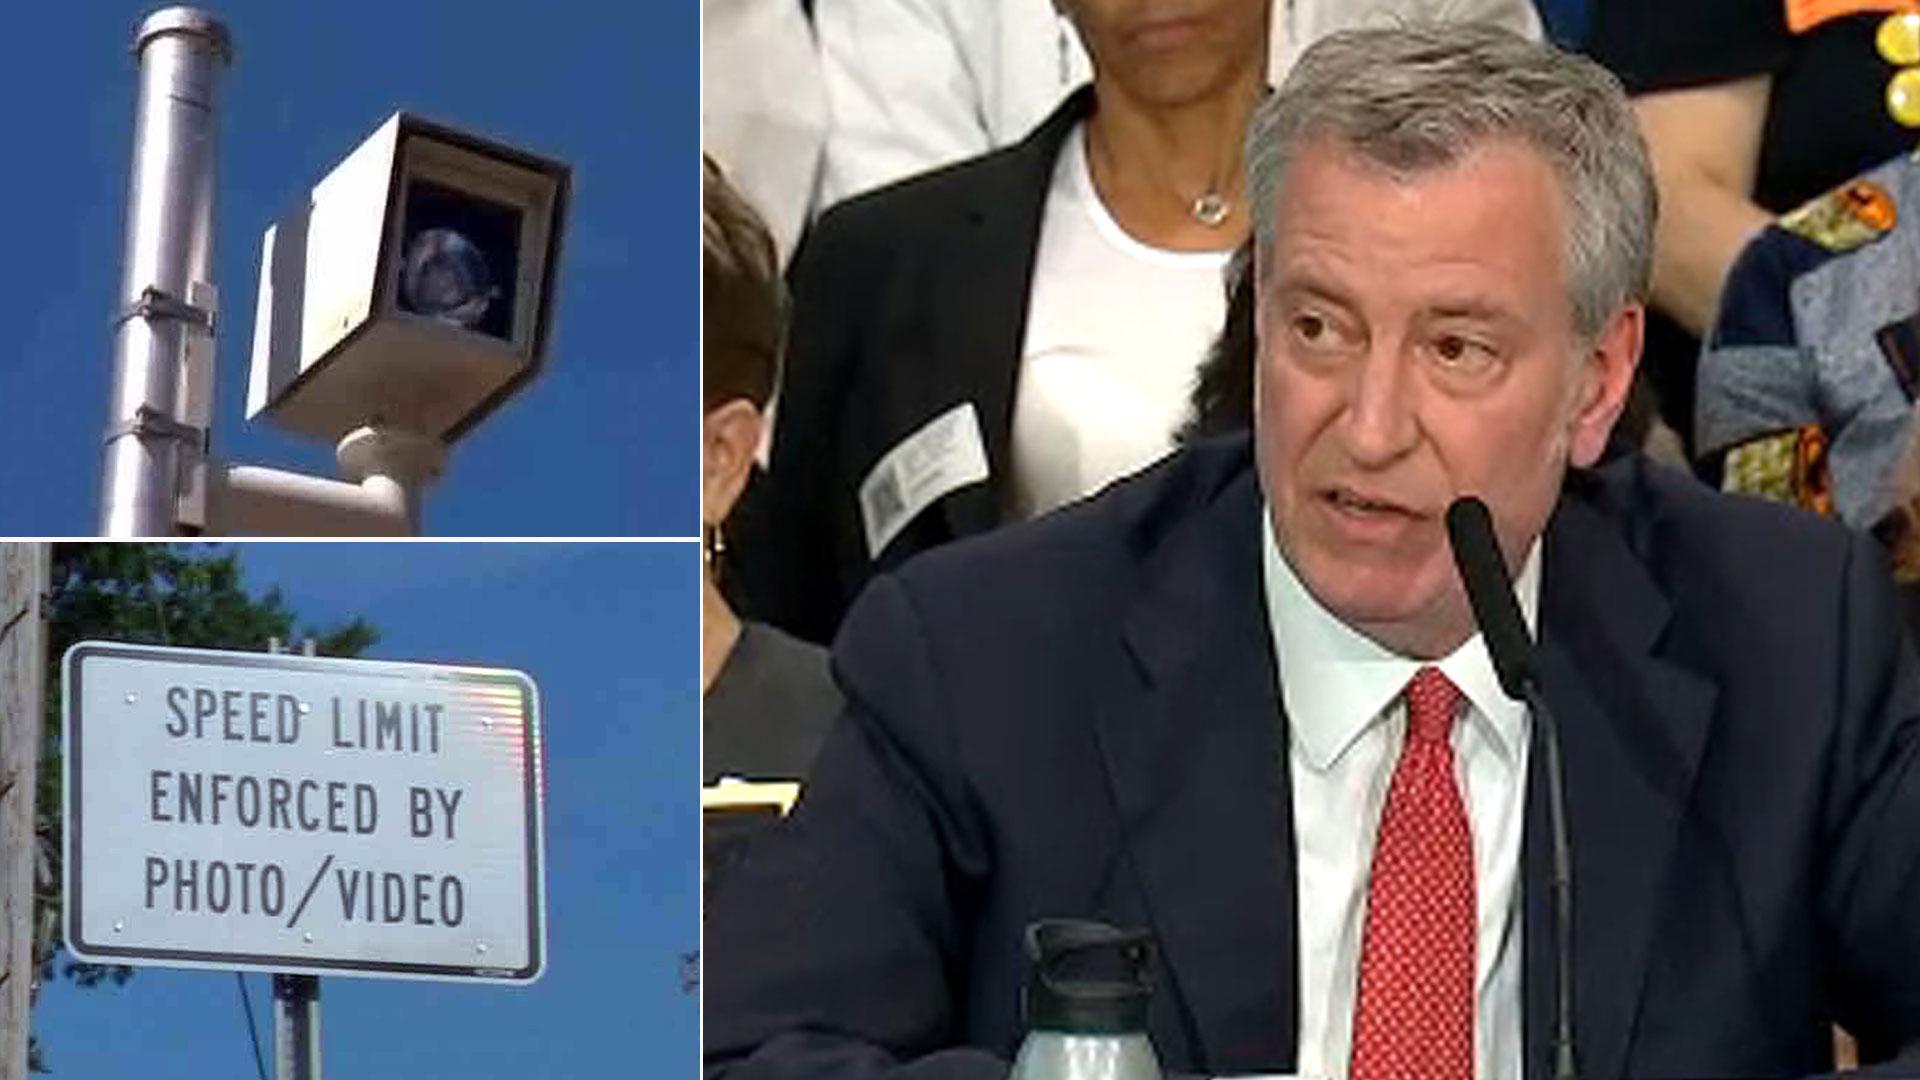 Mayor plans major expansion of speed cameras in New York City school zones